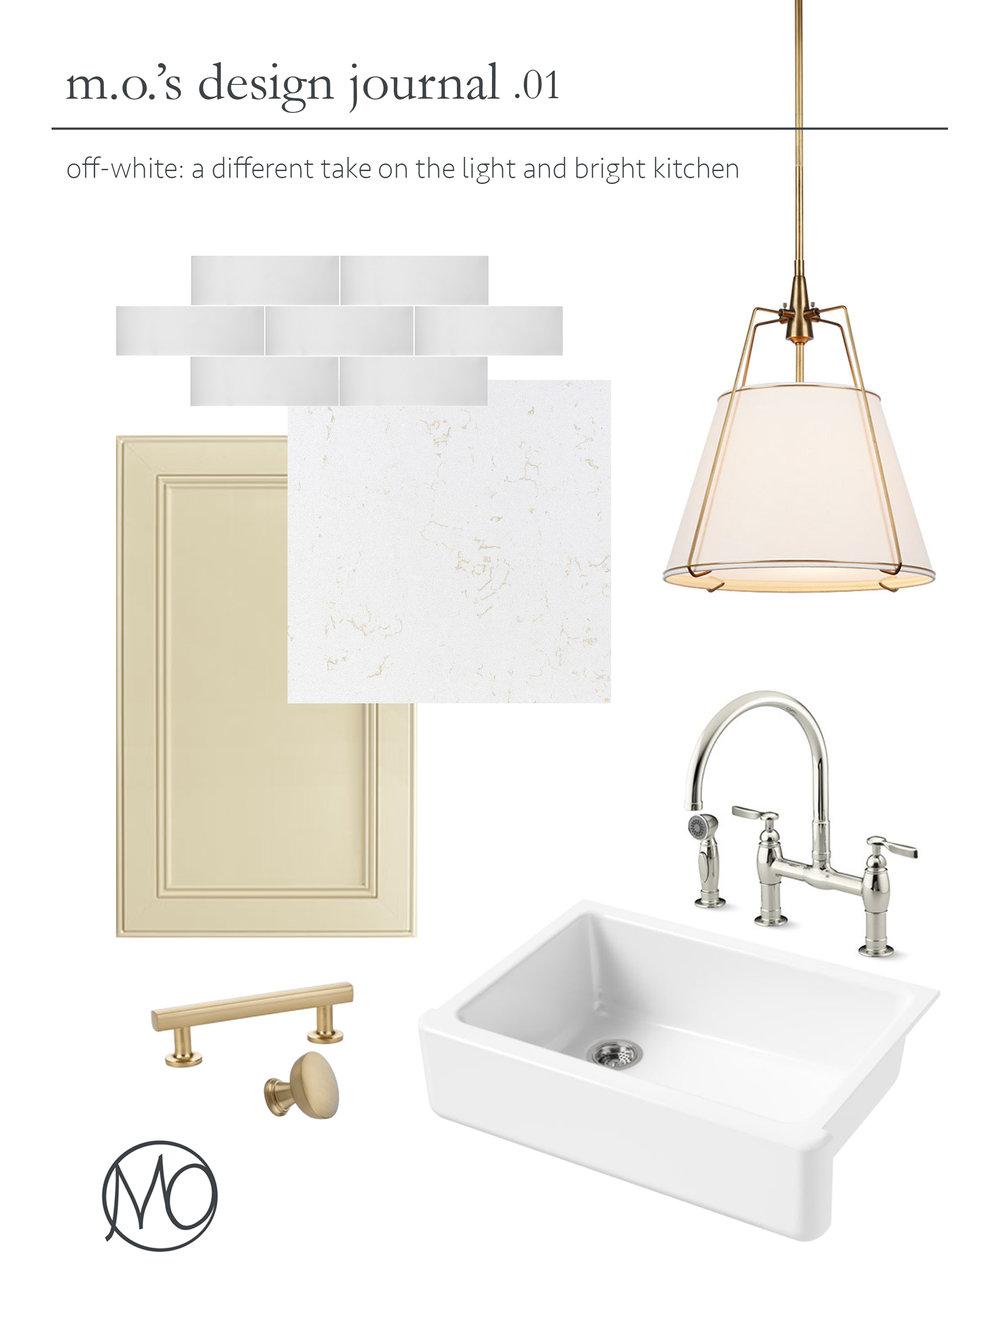 m.o.\'s design journal: an off-white kitchen — Madelyn Oliver